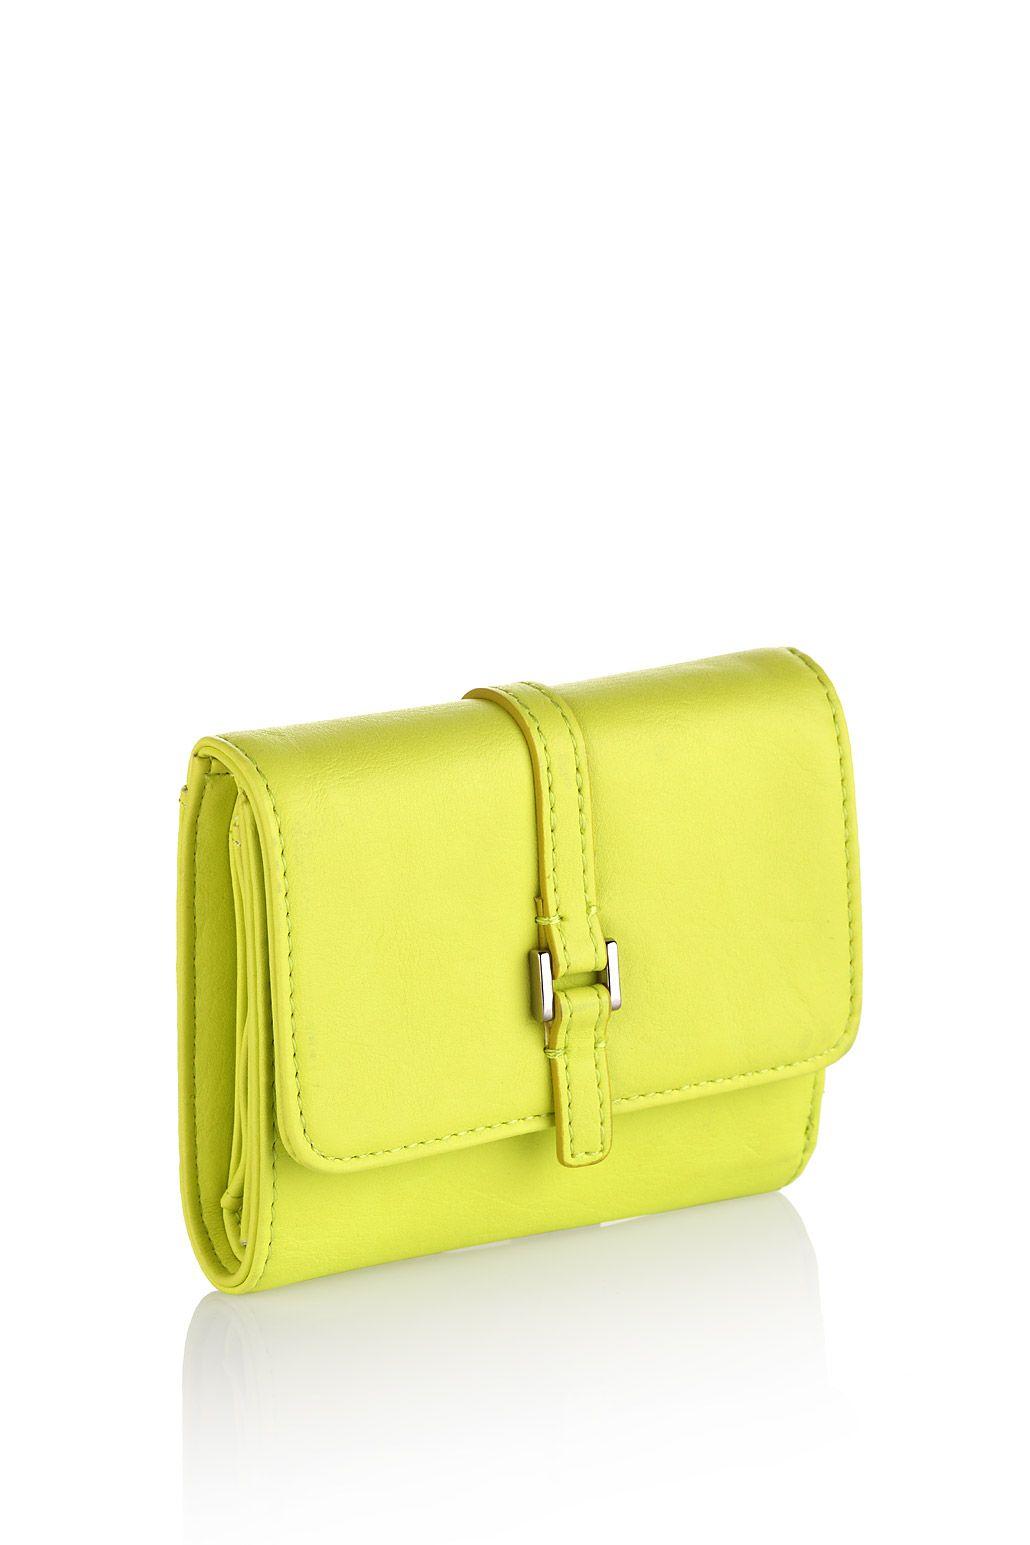 Portemonnee Dames Esprit.Portemonnee Voor Dames Casual Esprit Online Shop Nice Outfits